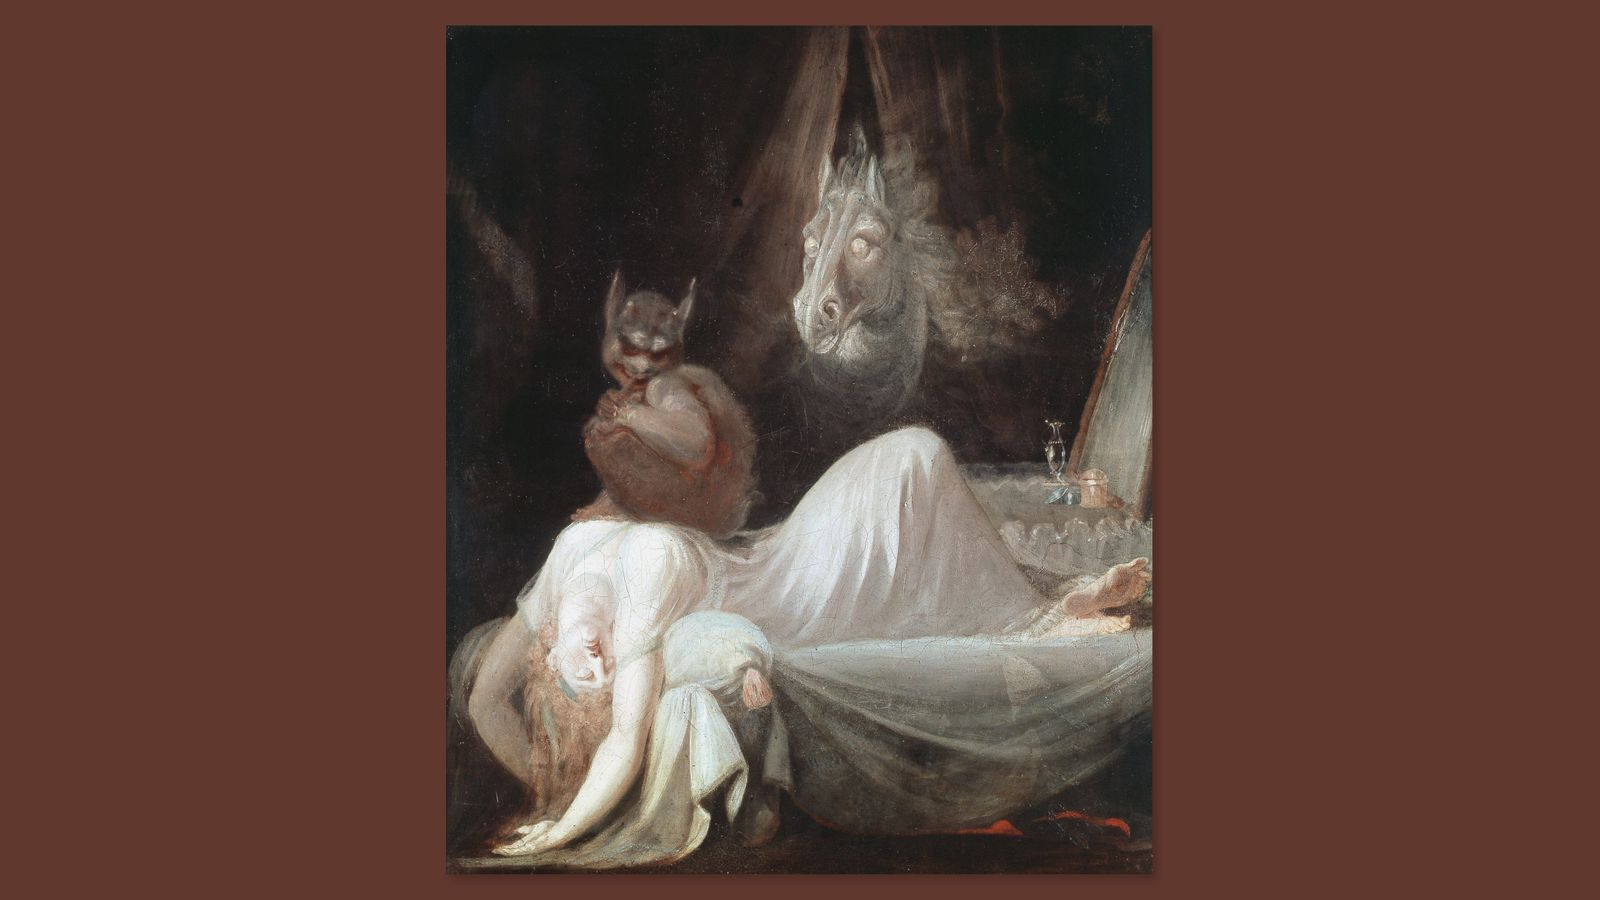 The Nightmare 1781 Painting by Henry Fuseli Johann Heinrich Fussli 1741 1825 Swiss born English